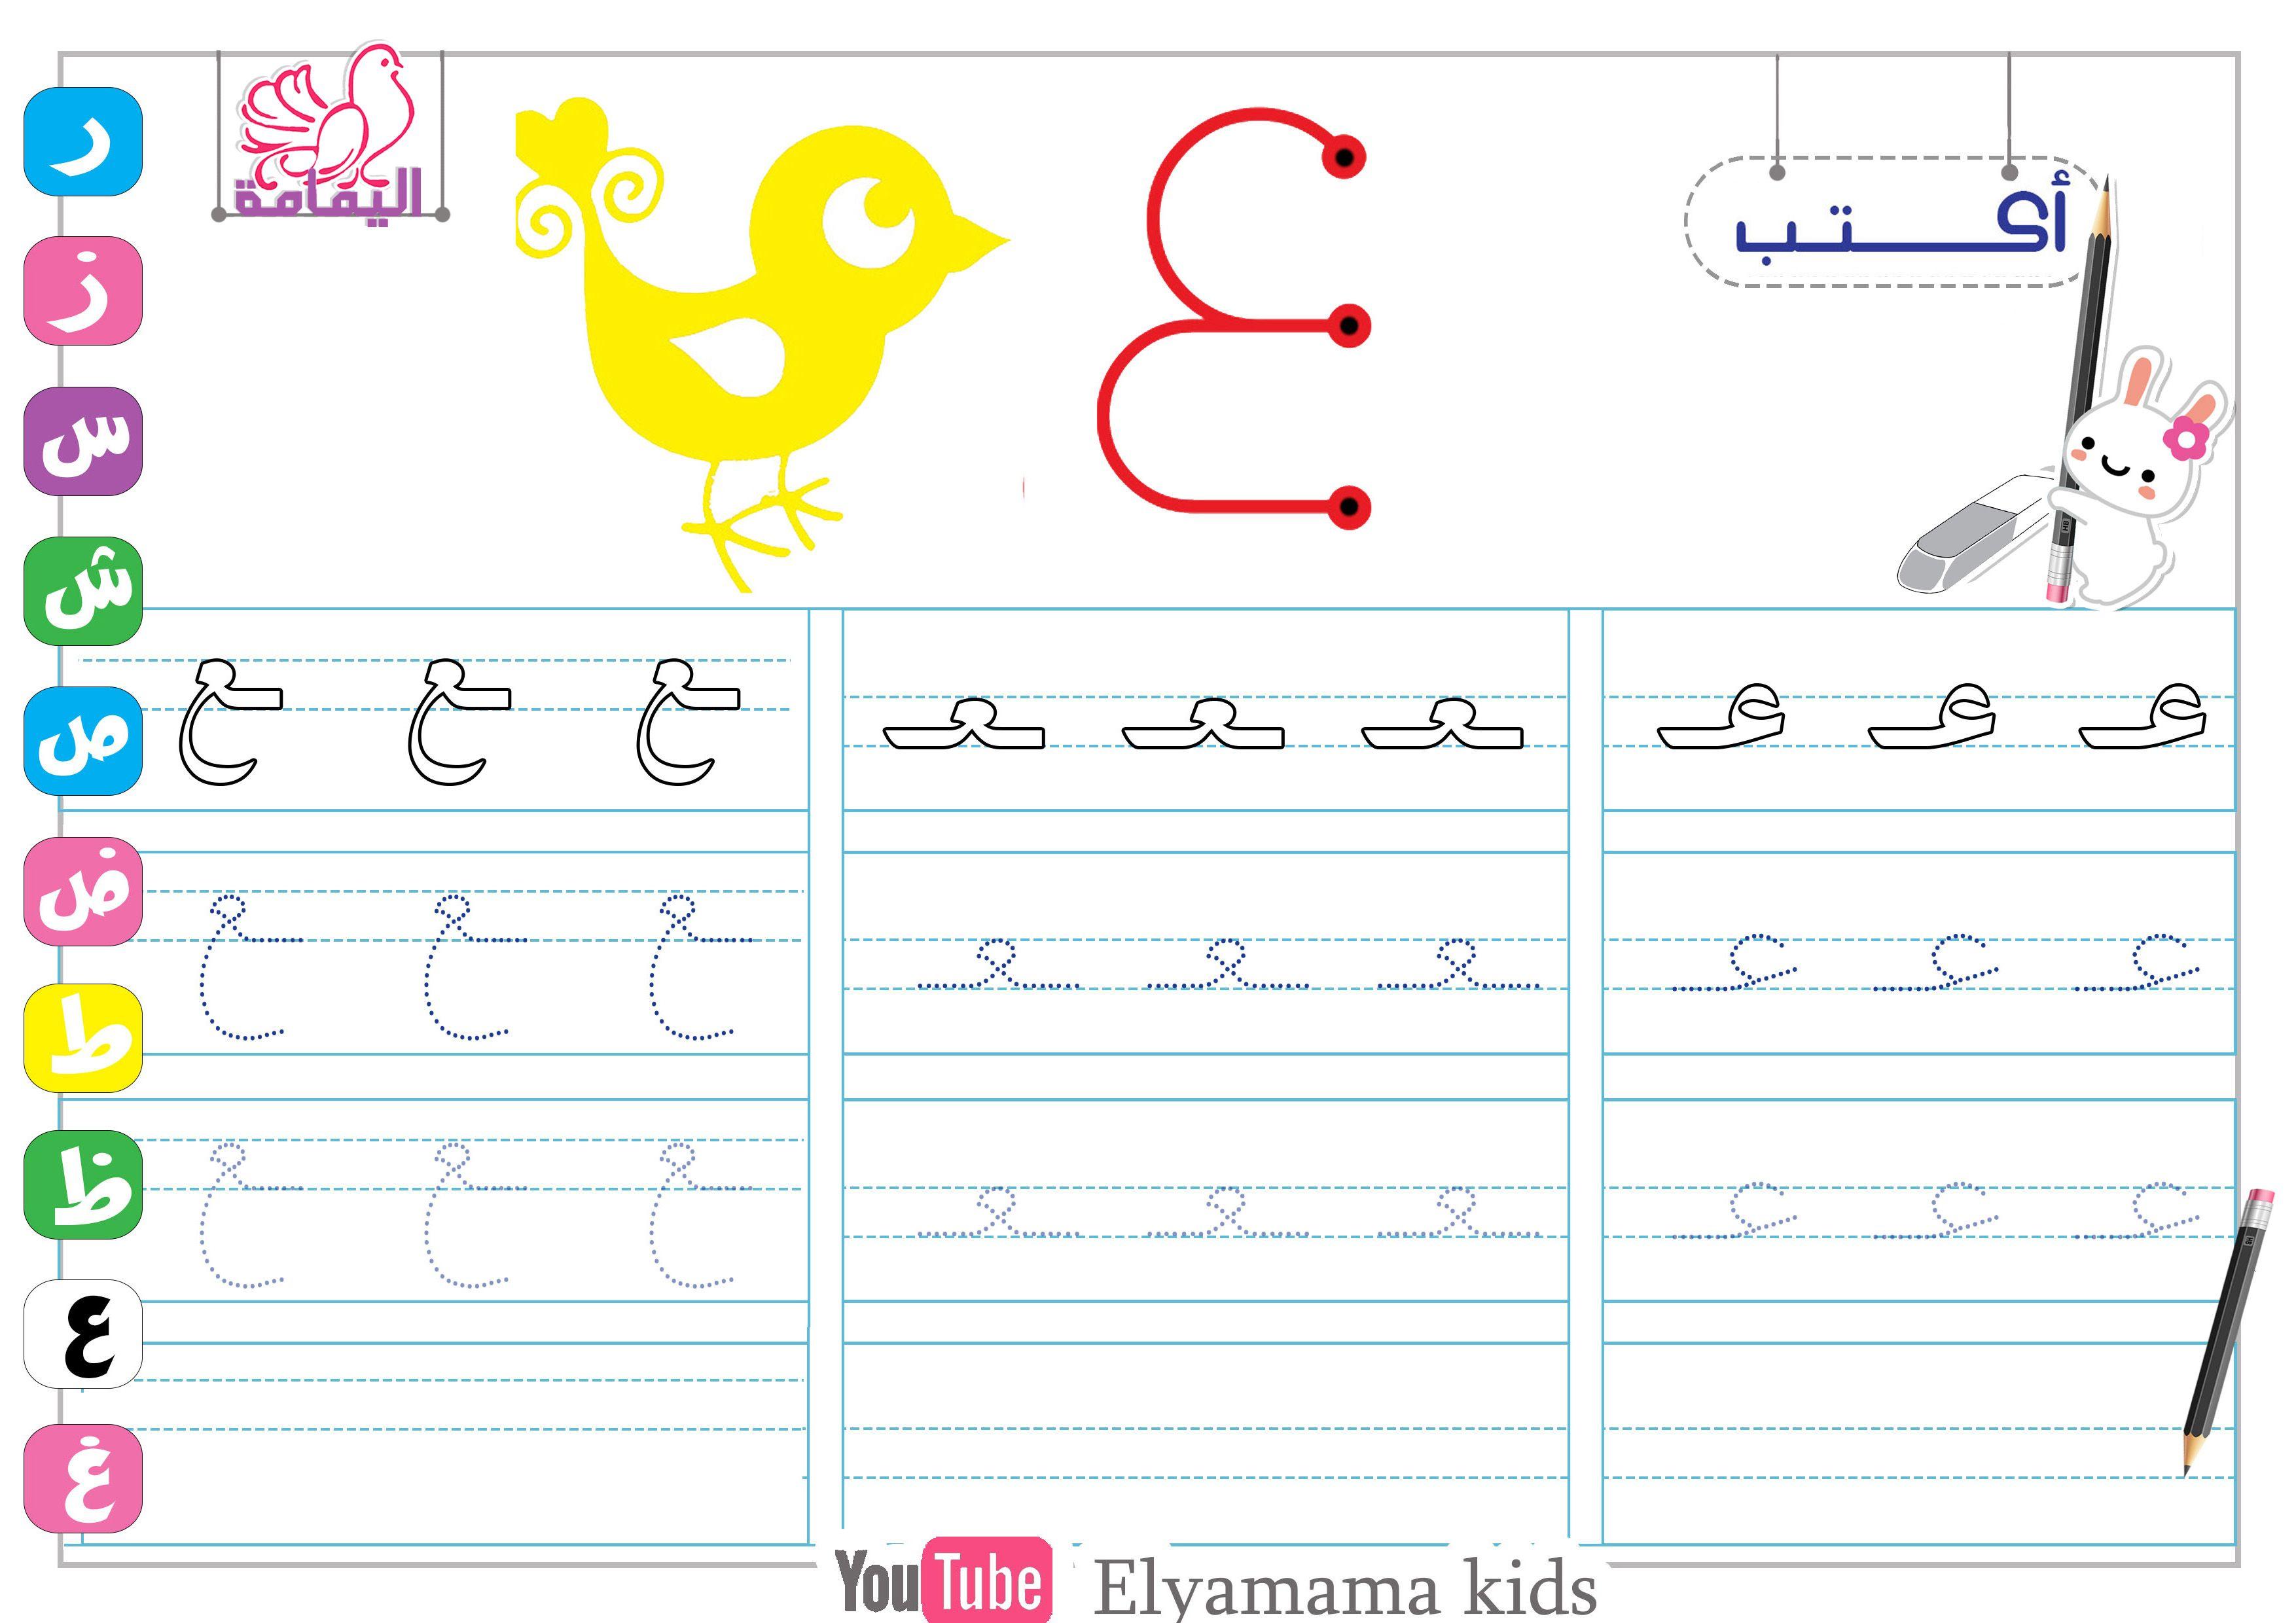 Elyamama Adli Kullanicinin أوراق خاصة بفيديو اليوتيوب Panosundaki Pin Harf Calisma